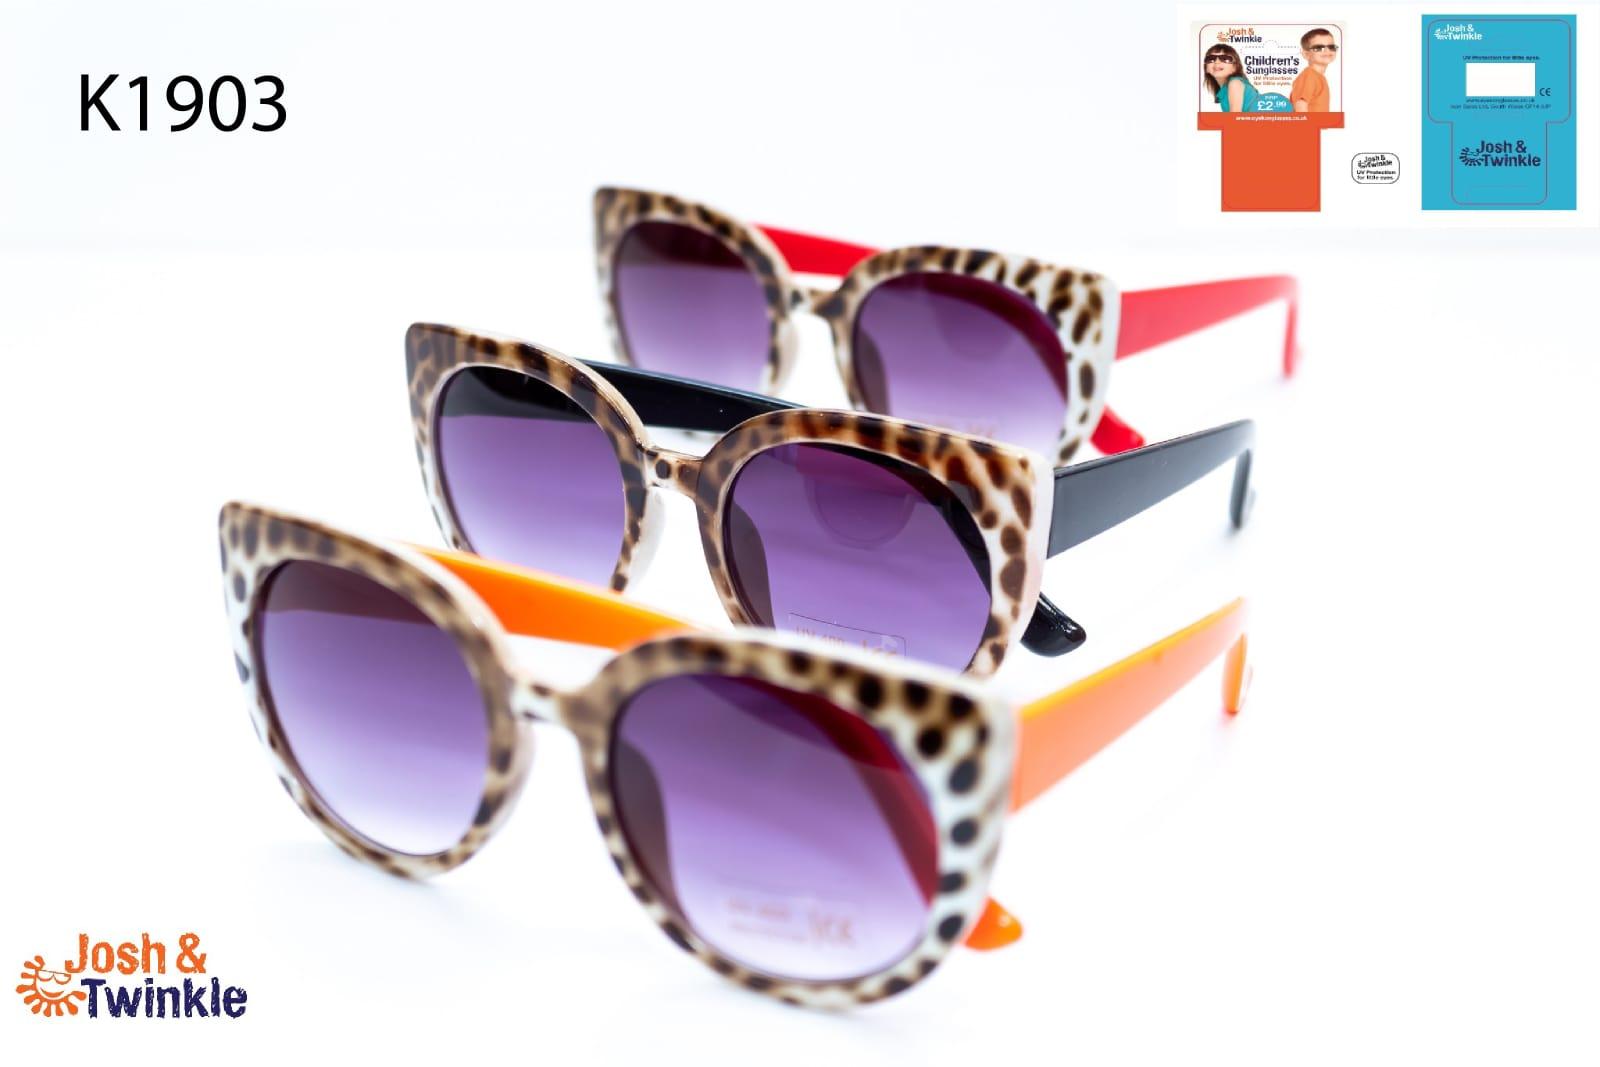 Joblot of Girls leopard print sunglasses 24 glasses in each joblot 3 different colors!